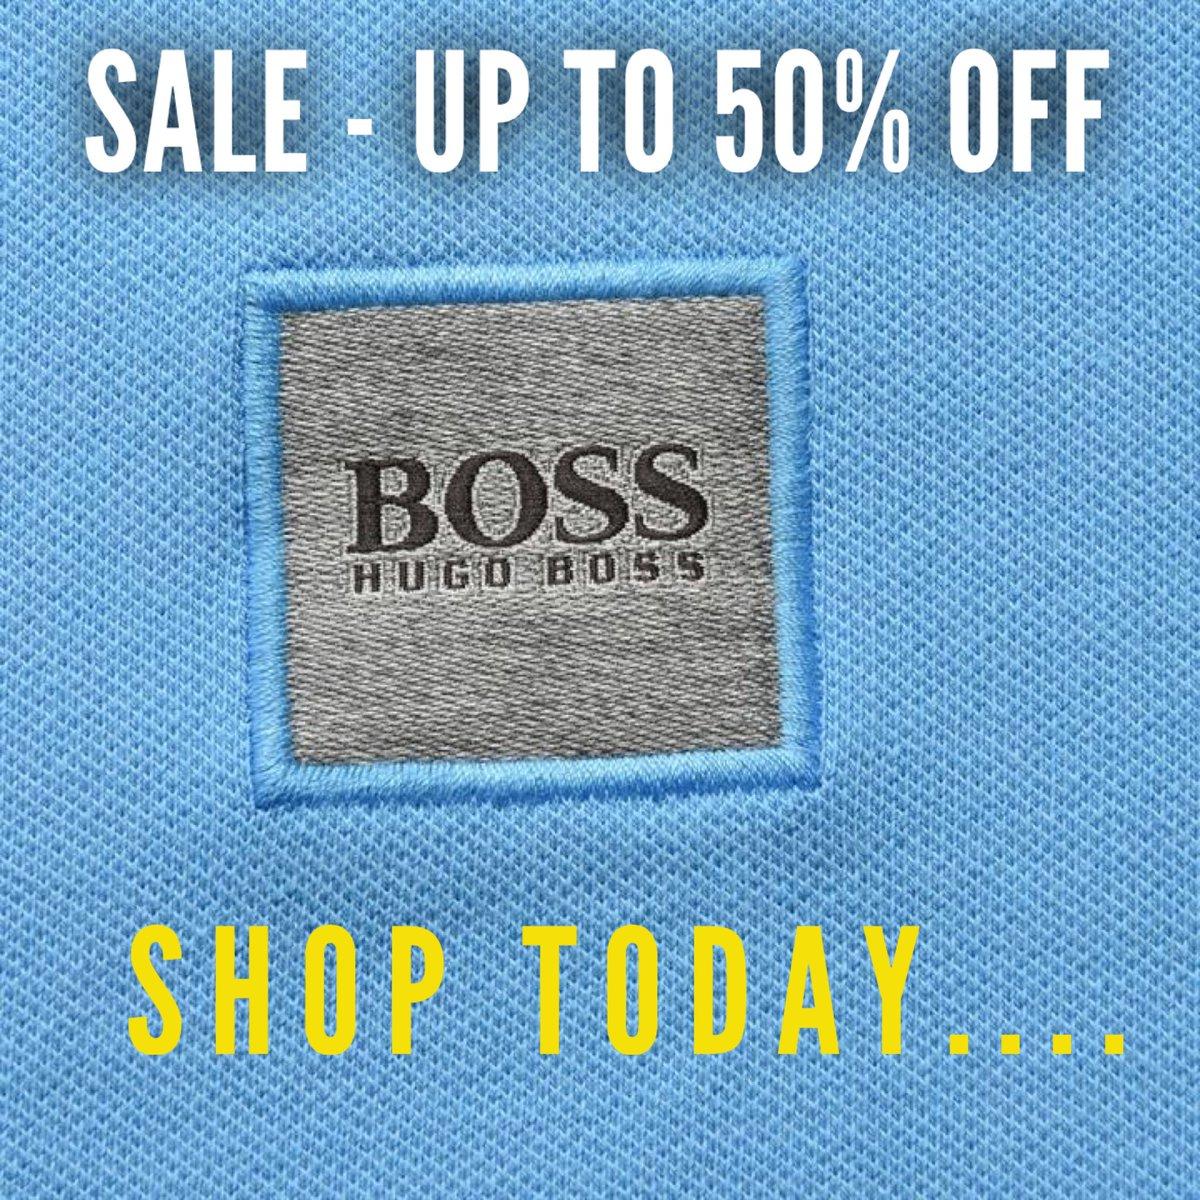 df24e64ff Shop here: https://bit.ly/2xRejP0 #hugoboss #hugo #boss #sale #mensfashion  #thecasualsdirectorypic.twitter.com/btqD6PyOme